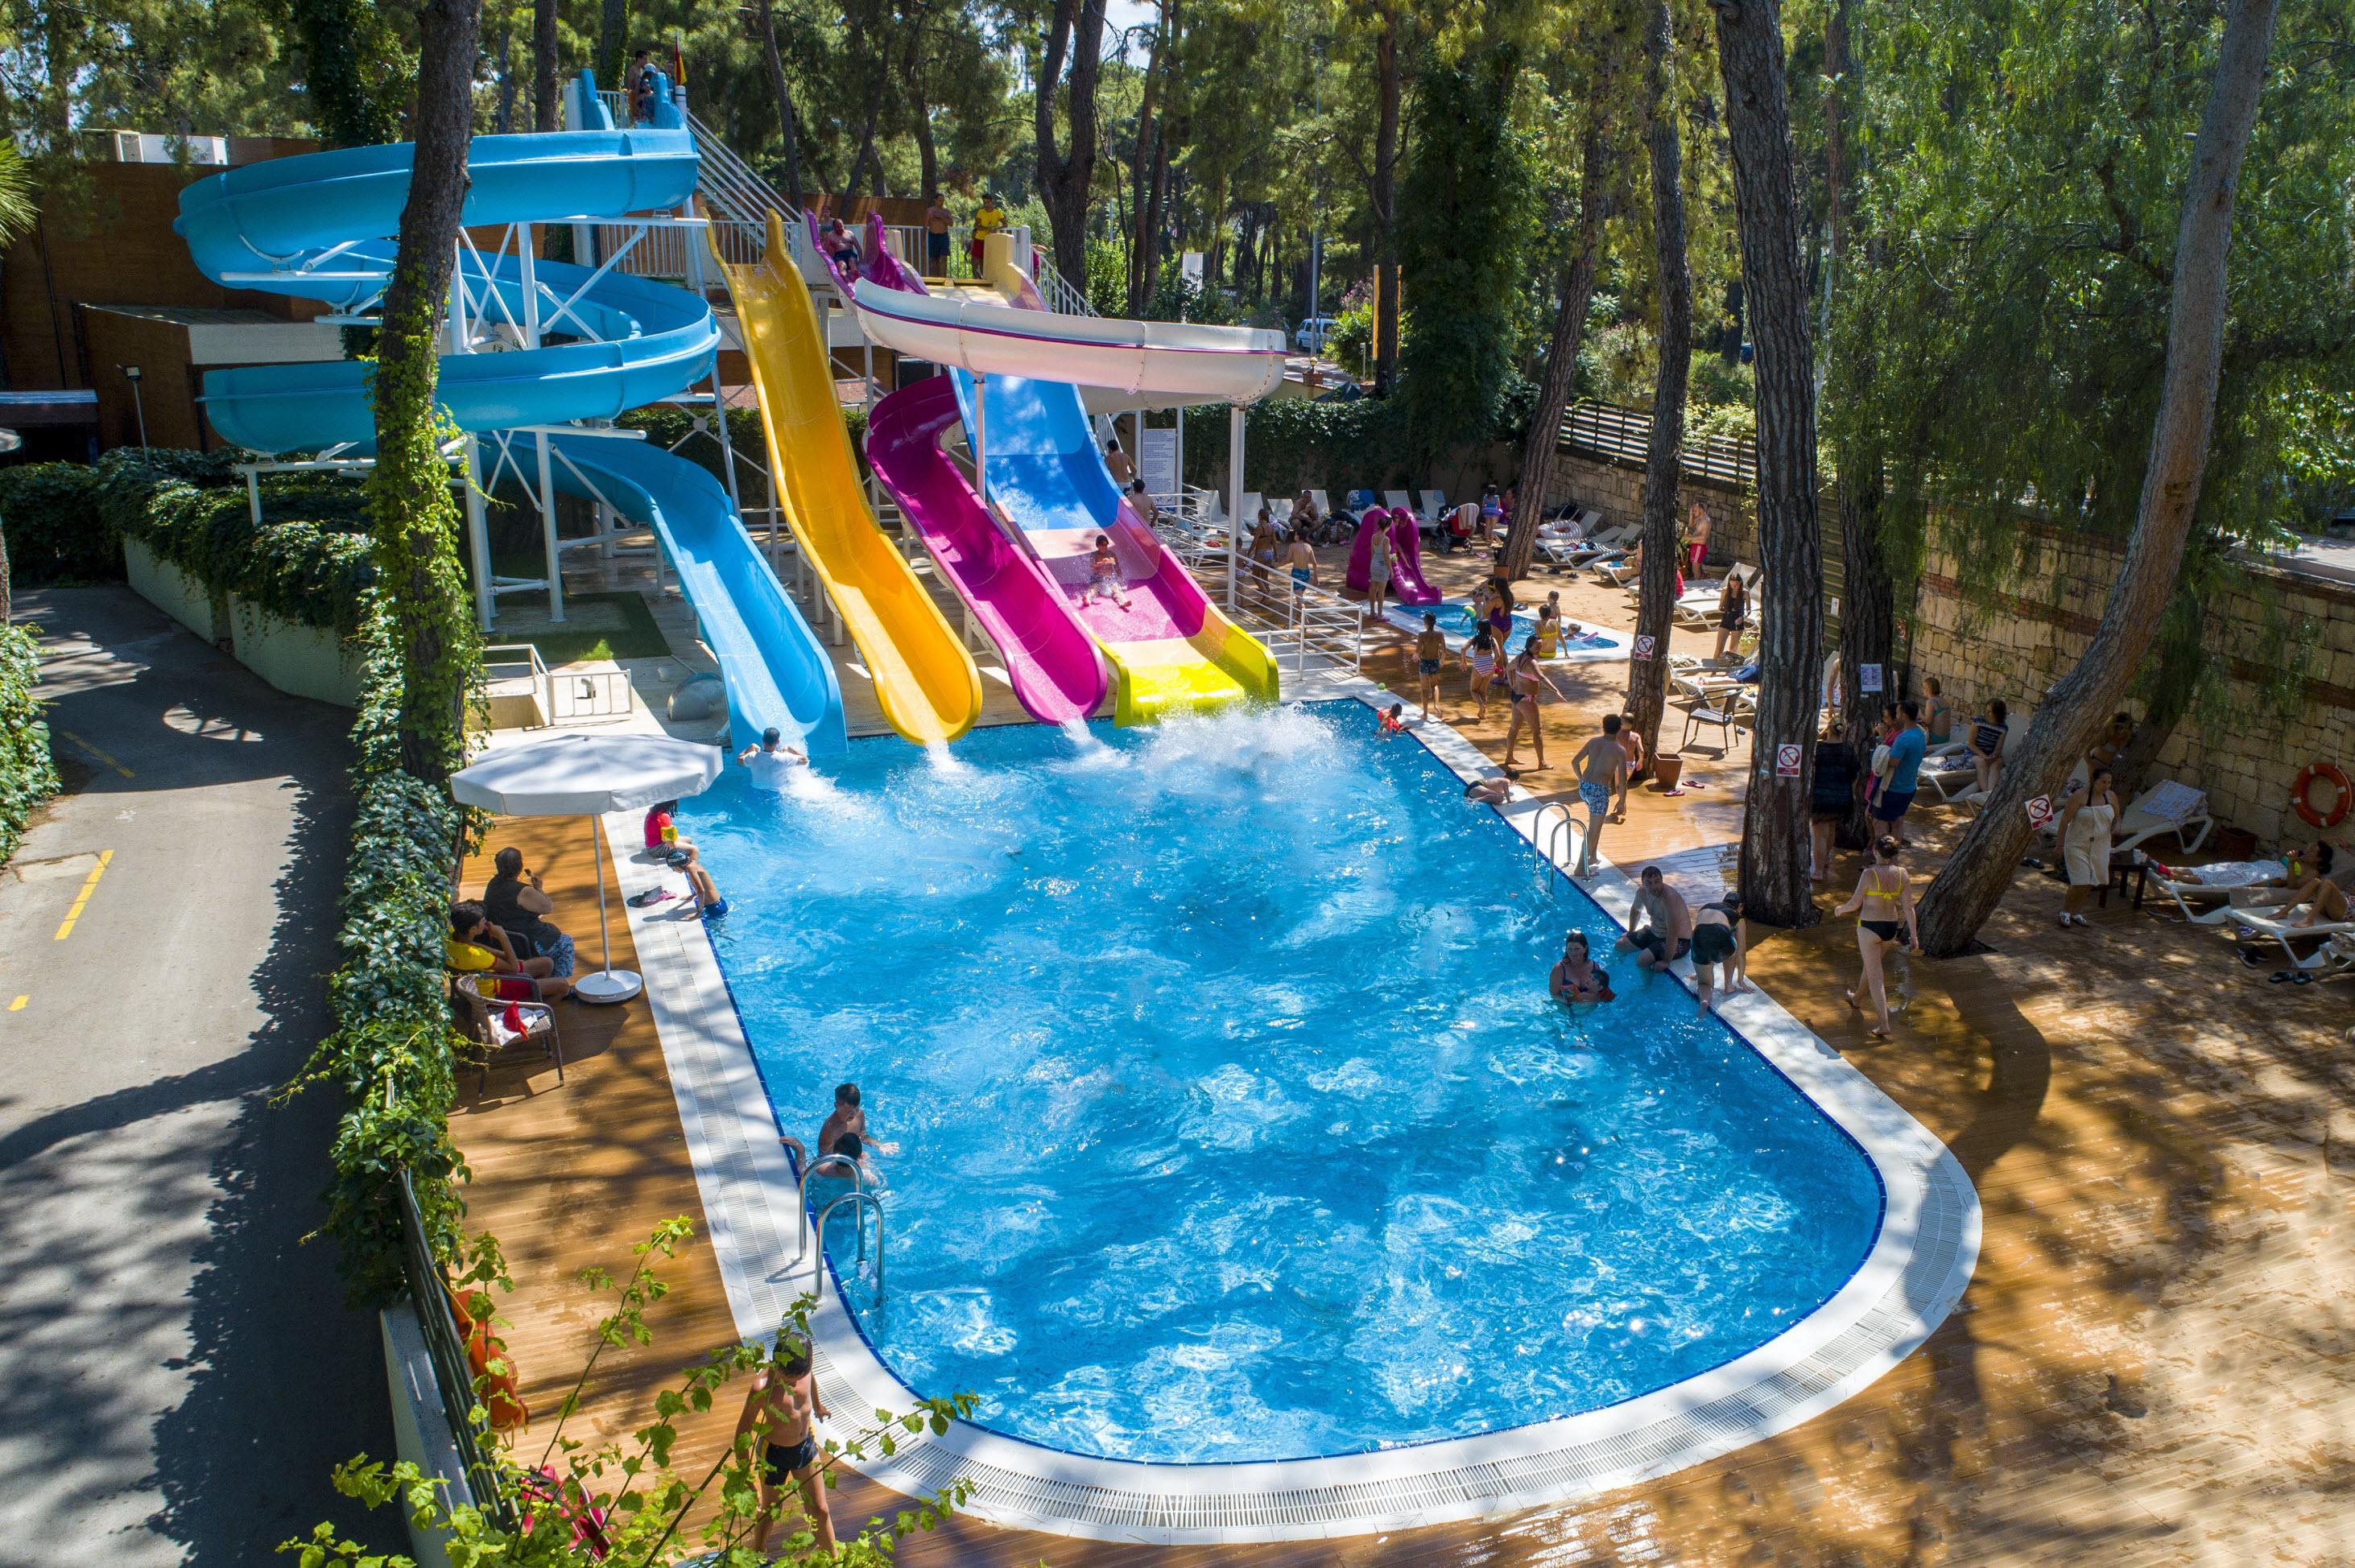 http://www.orextravel.sk/OREX/hotelphotos/ulusoy-kemer-holiday-club-area-008.jpg